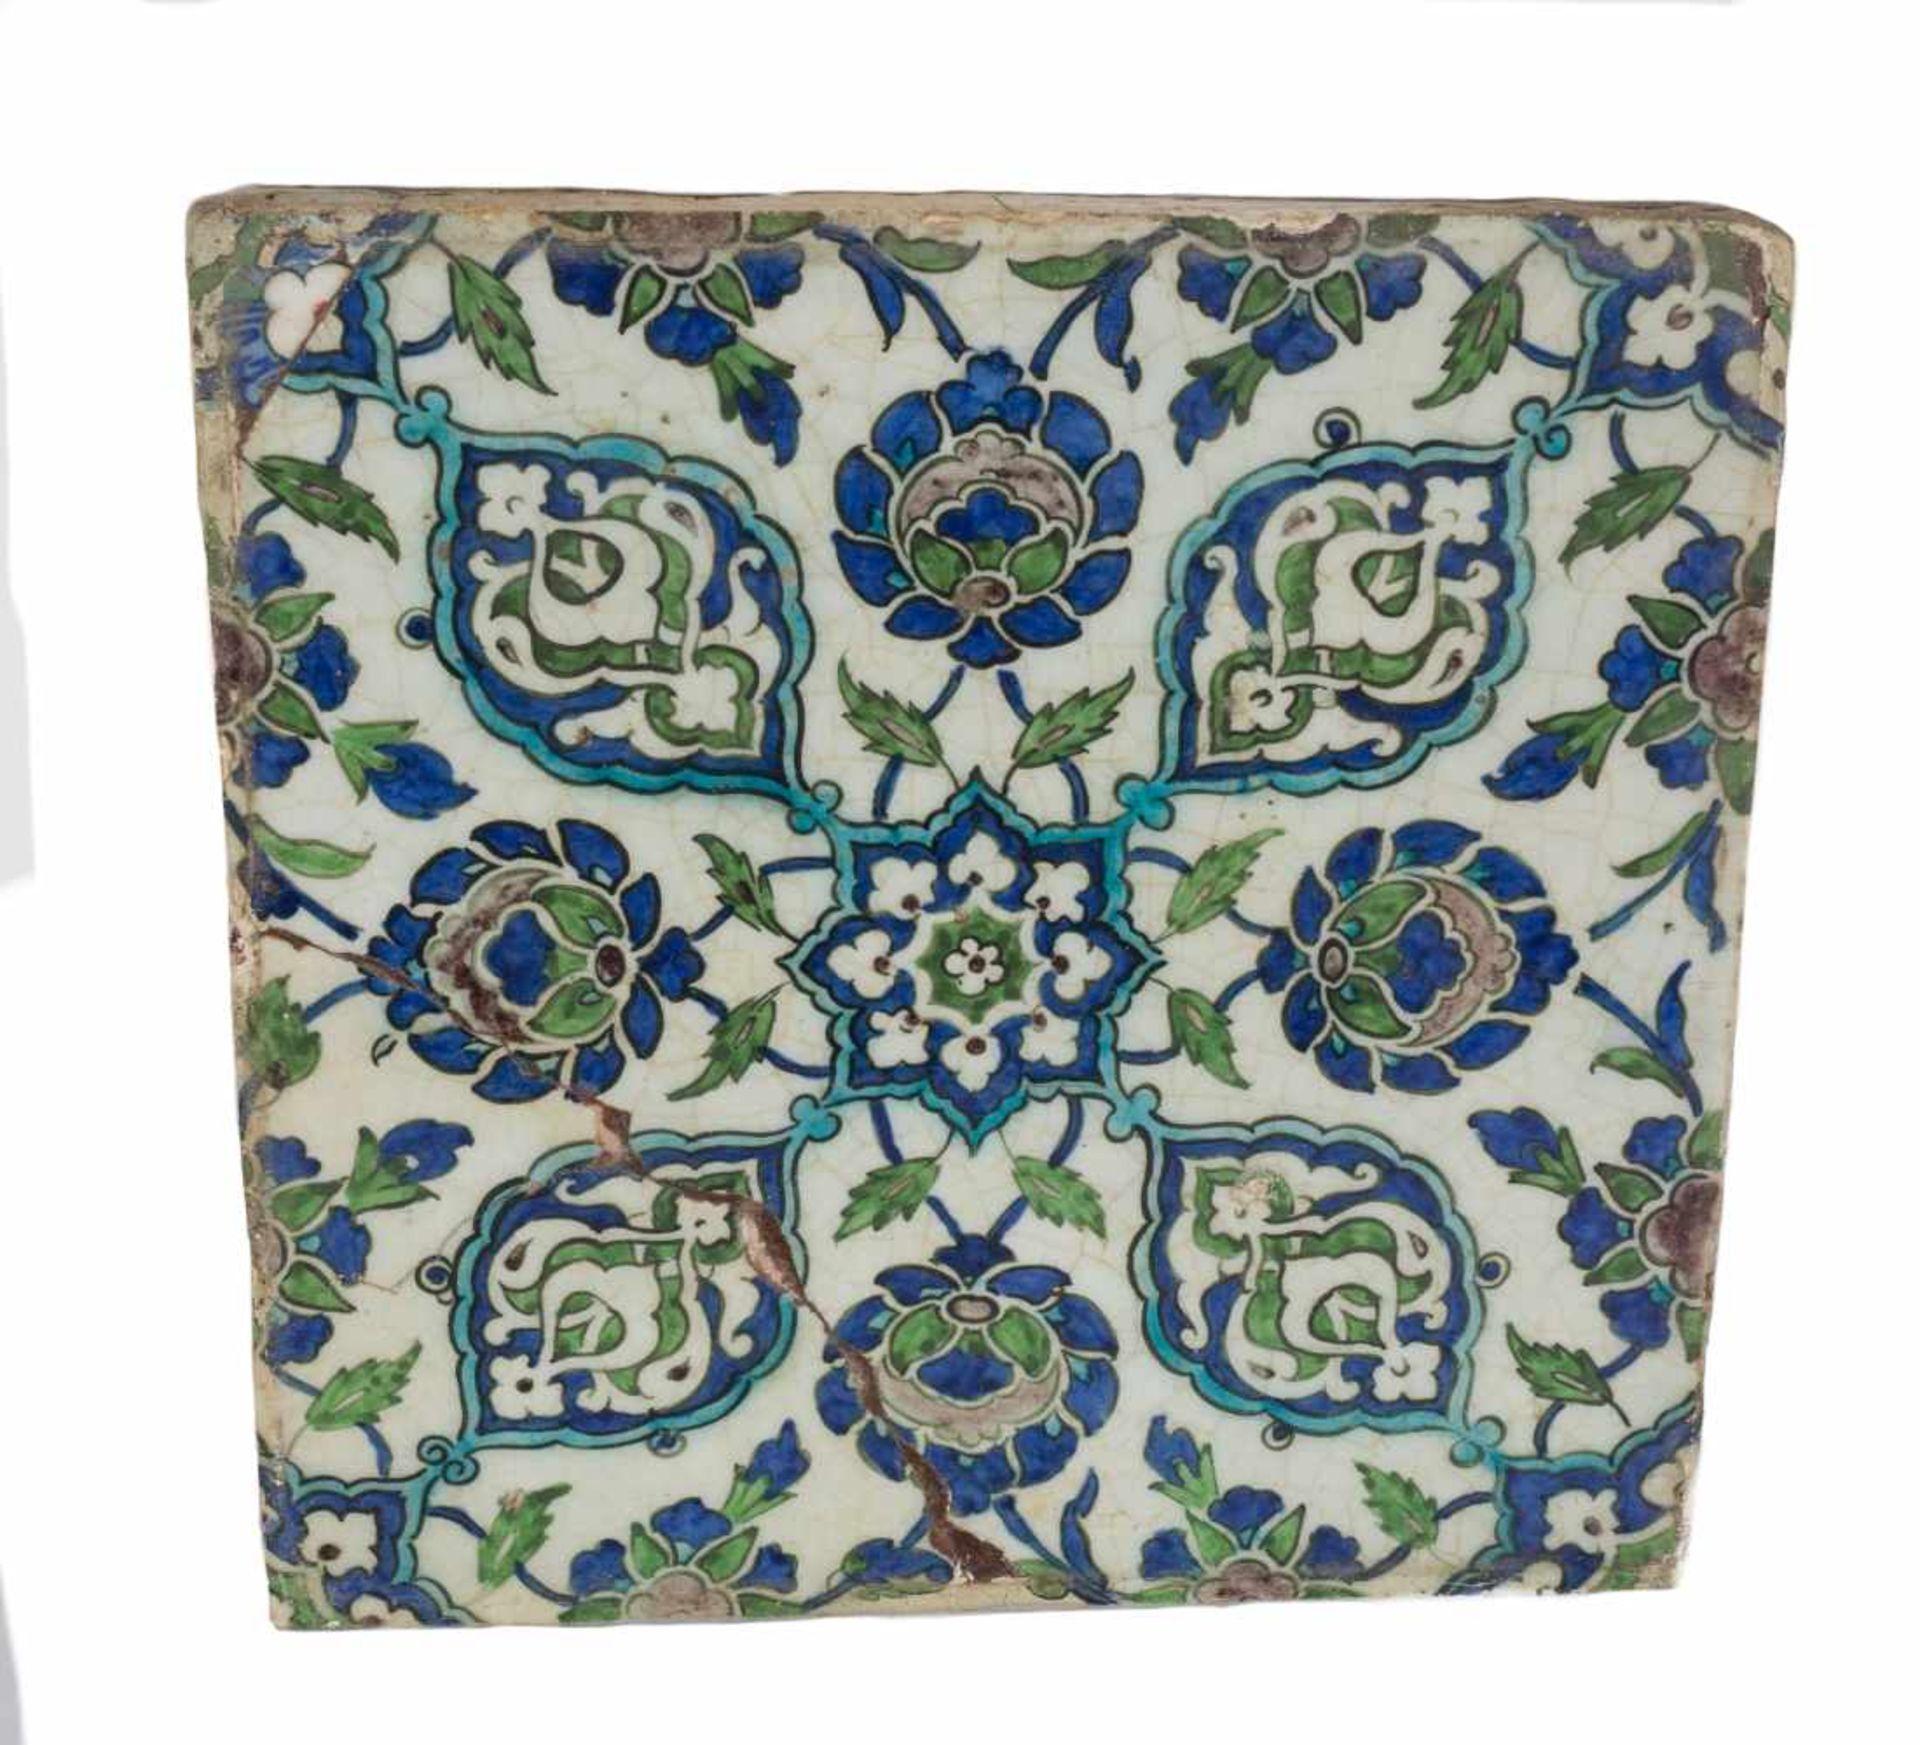 A damascus pottery tile ottoman. Syria. Circa 1565-1570. The white ground decorated in cobalt-b - Bild 3 aus 4